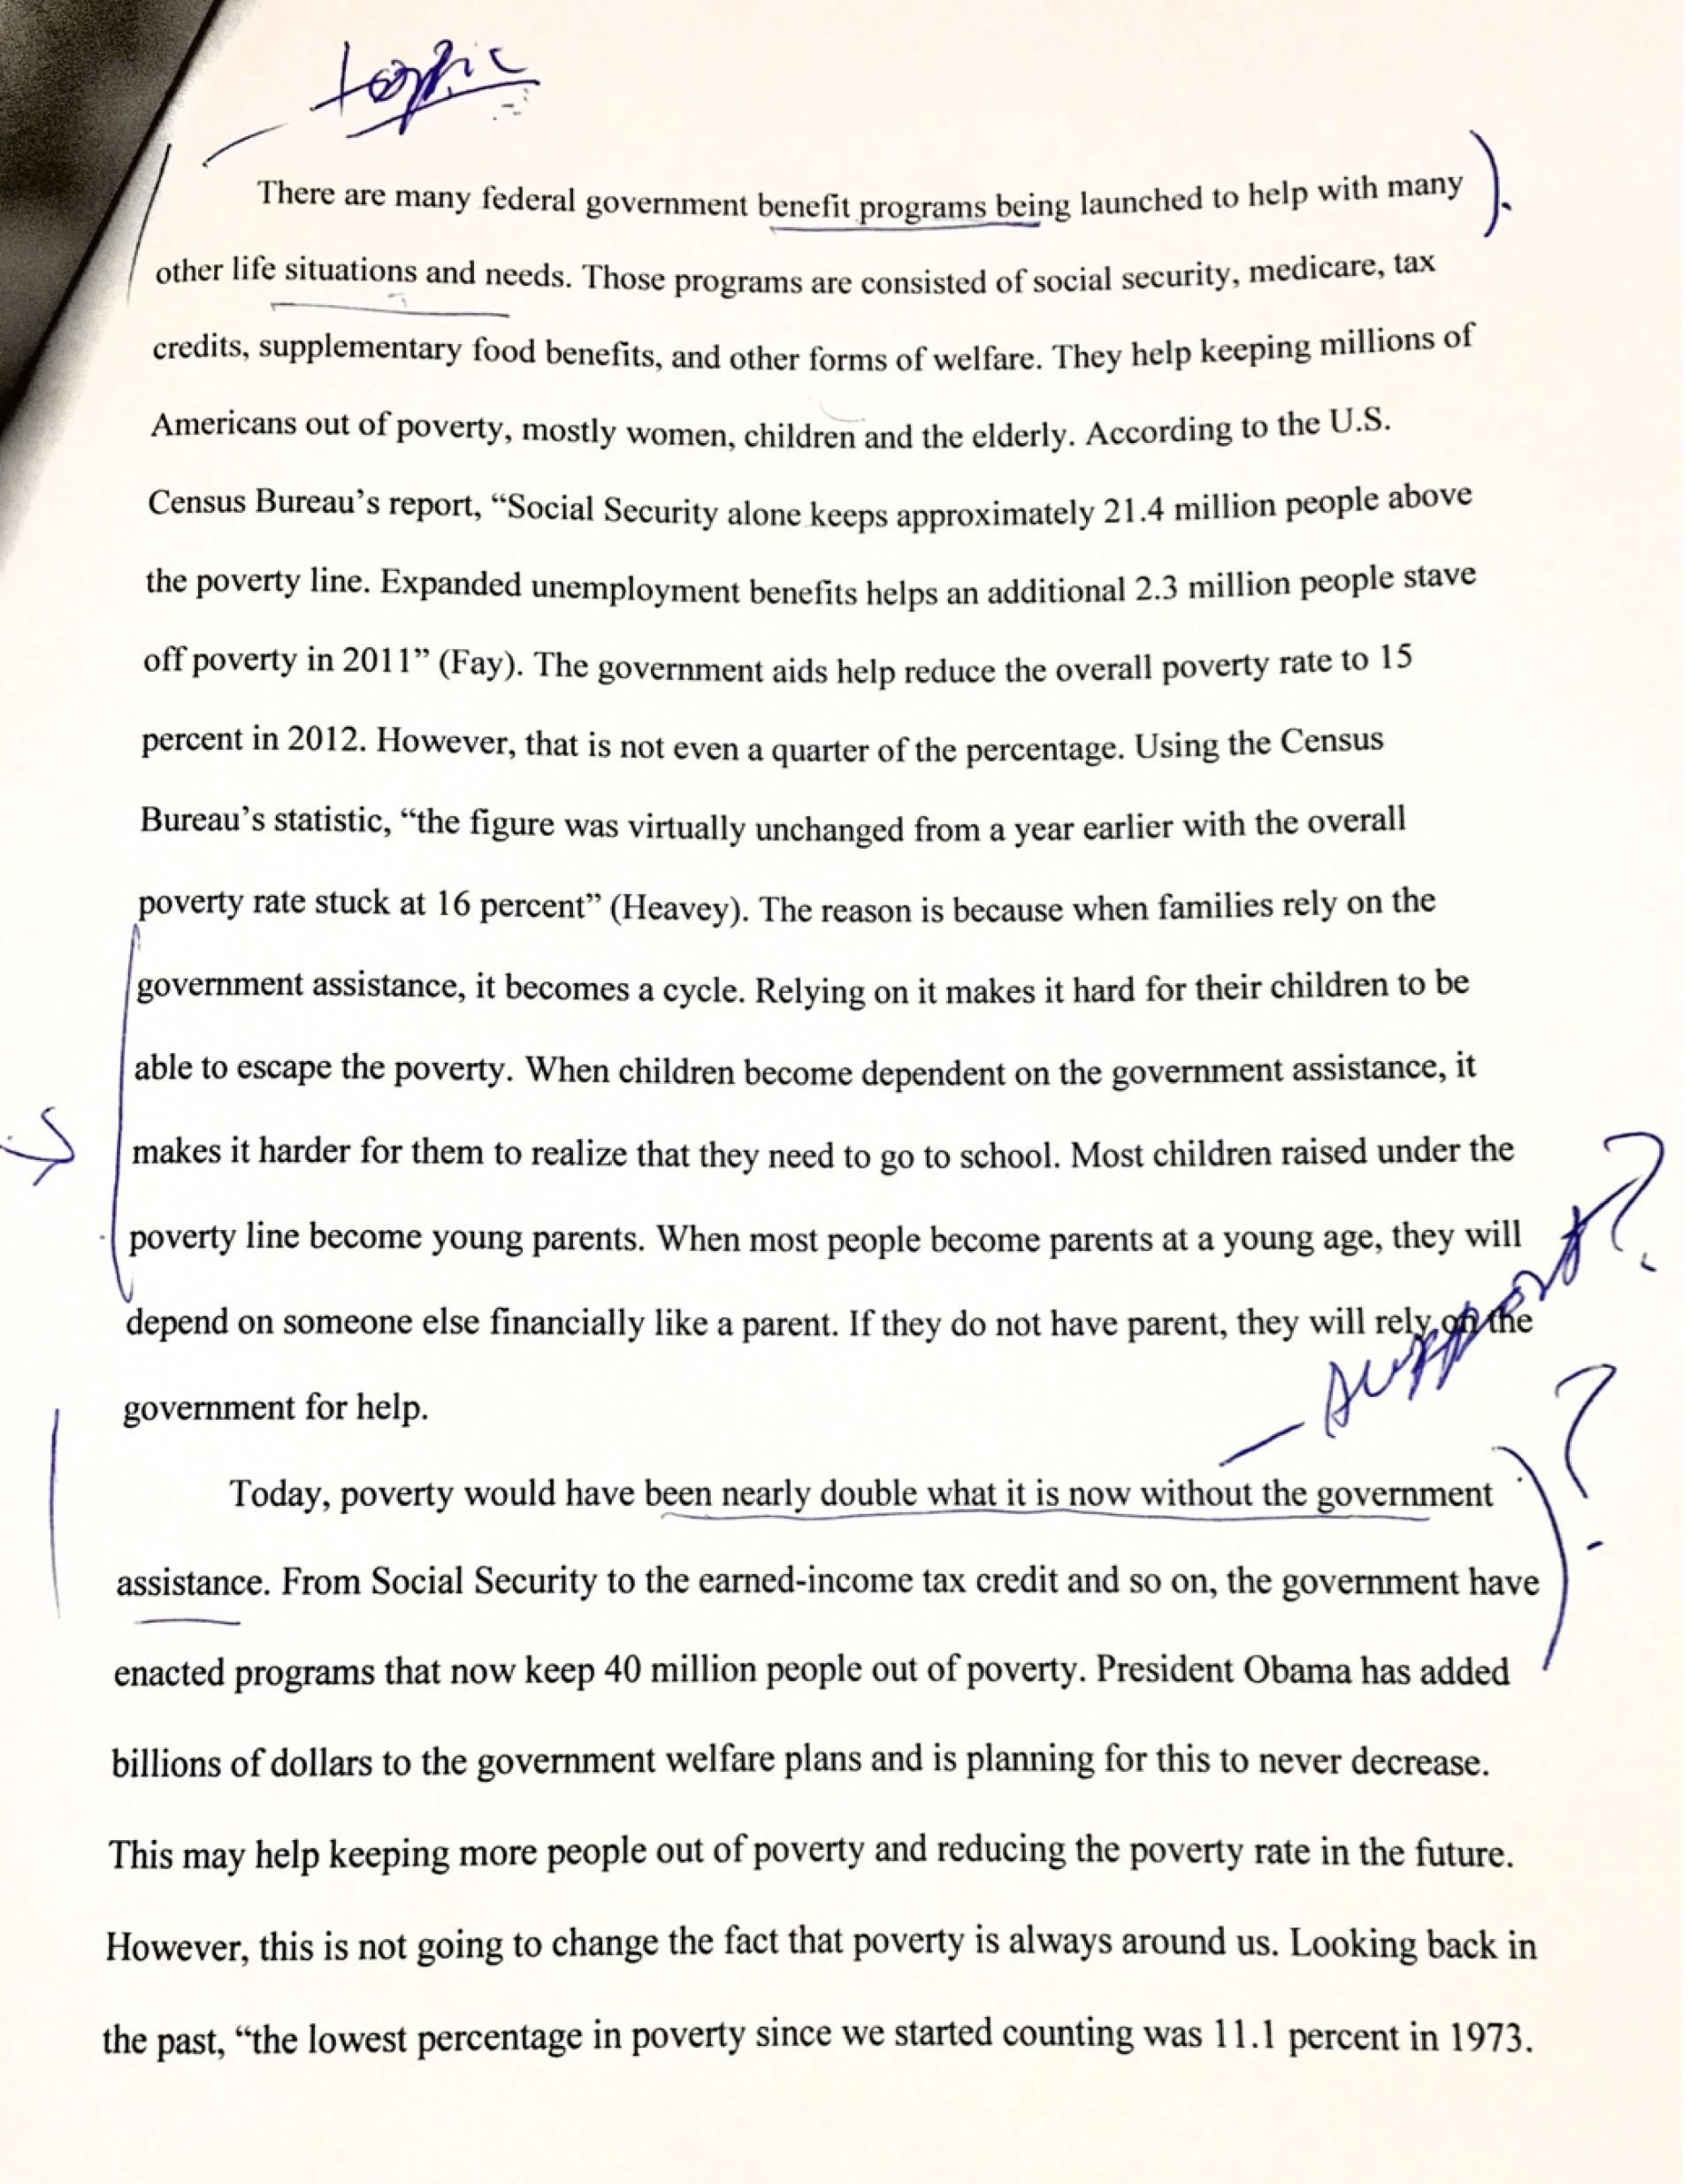 001 Fix My Essay Singular College Generator Free Help 1920